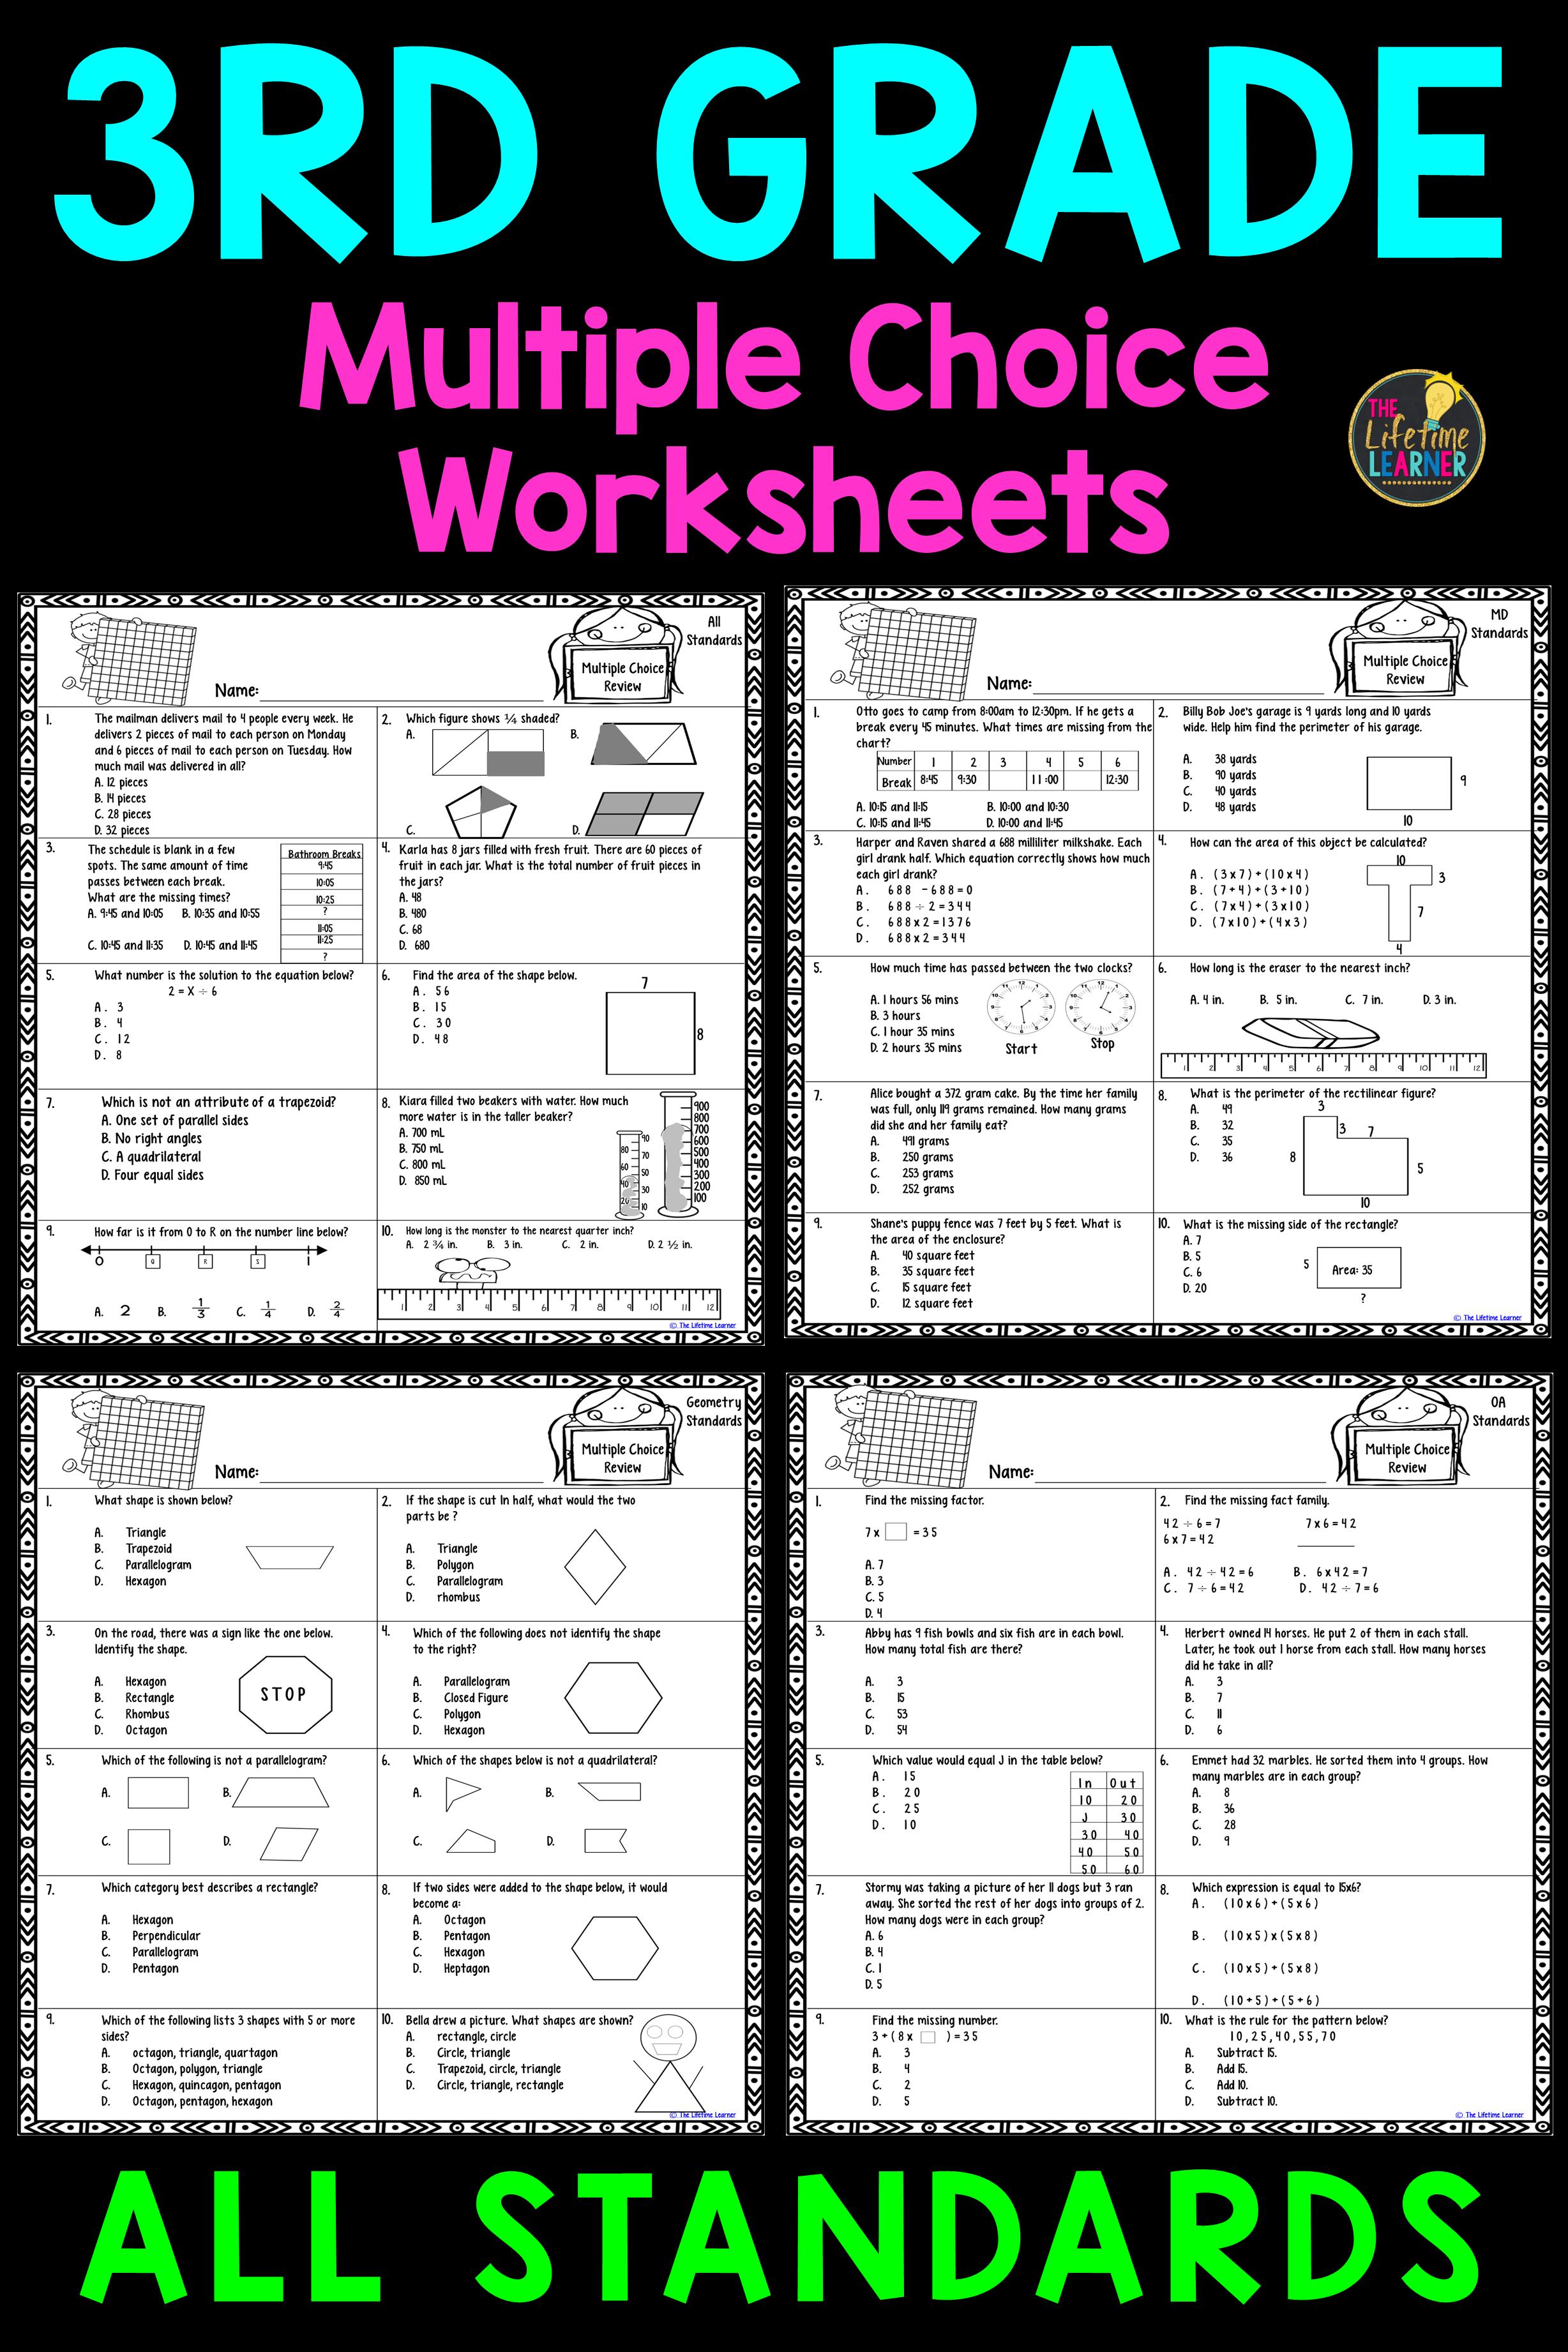 3rd Grade Multiple Choice Worksheets | Math worksheets, Morning work ...